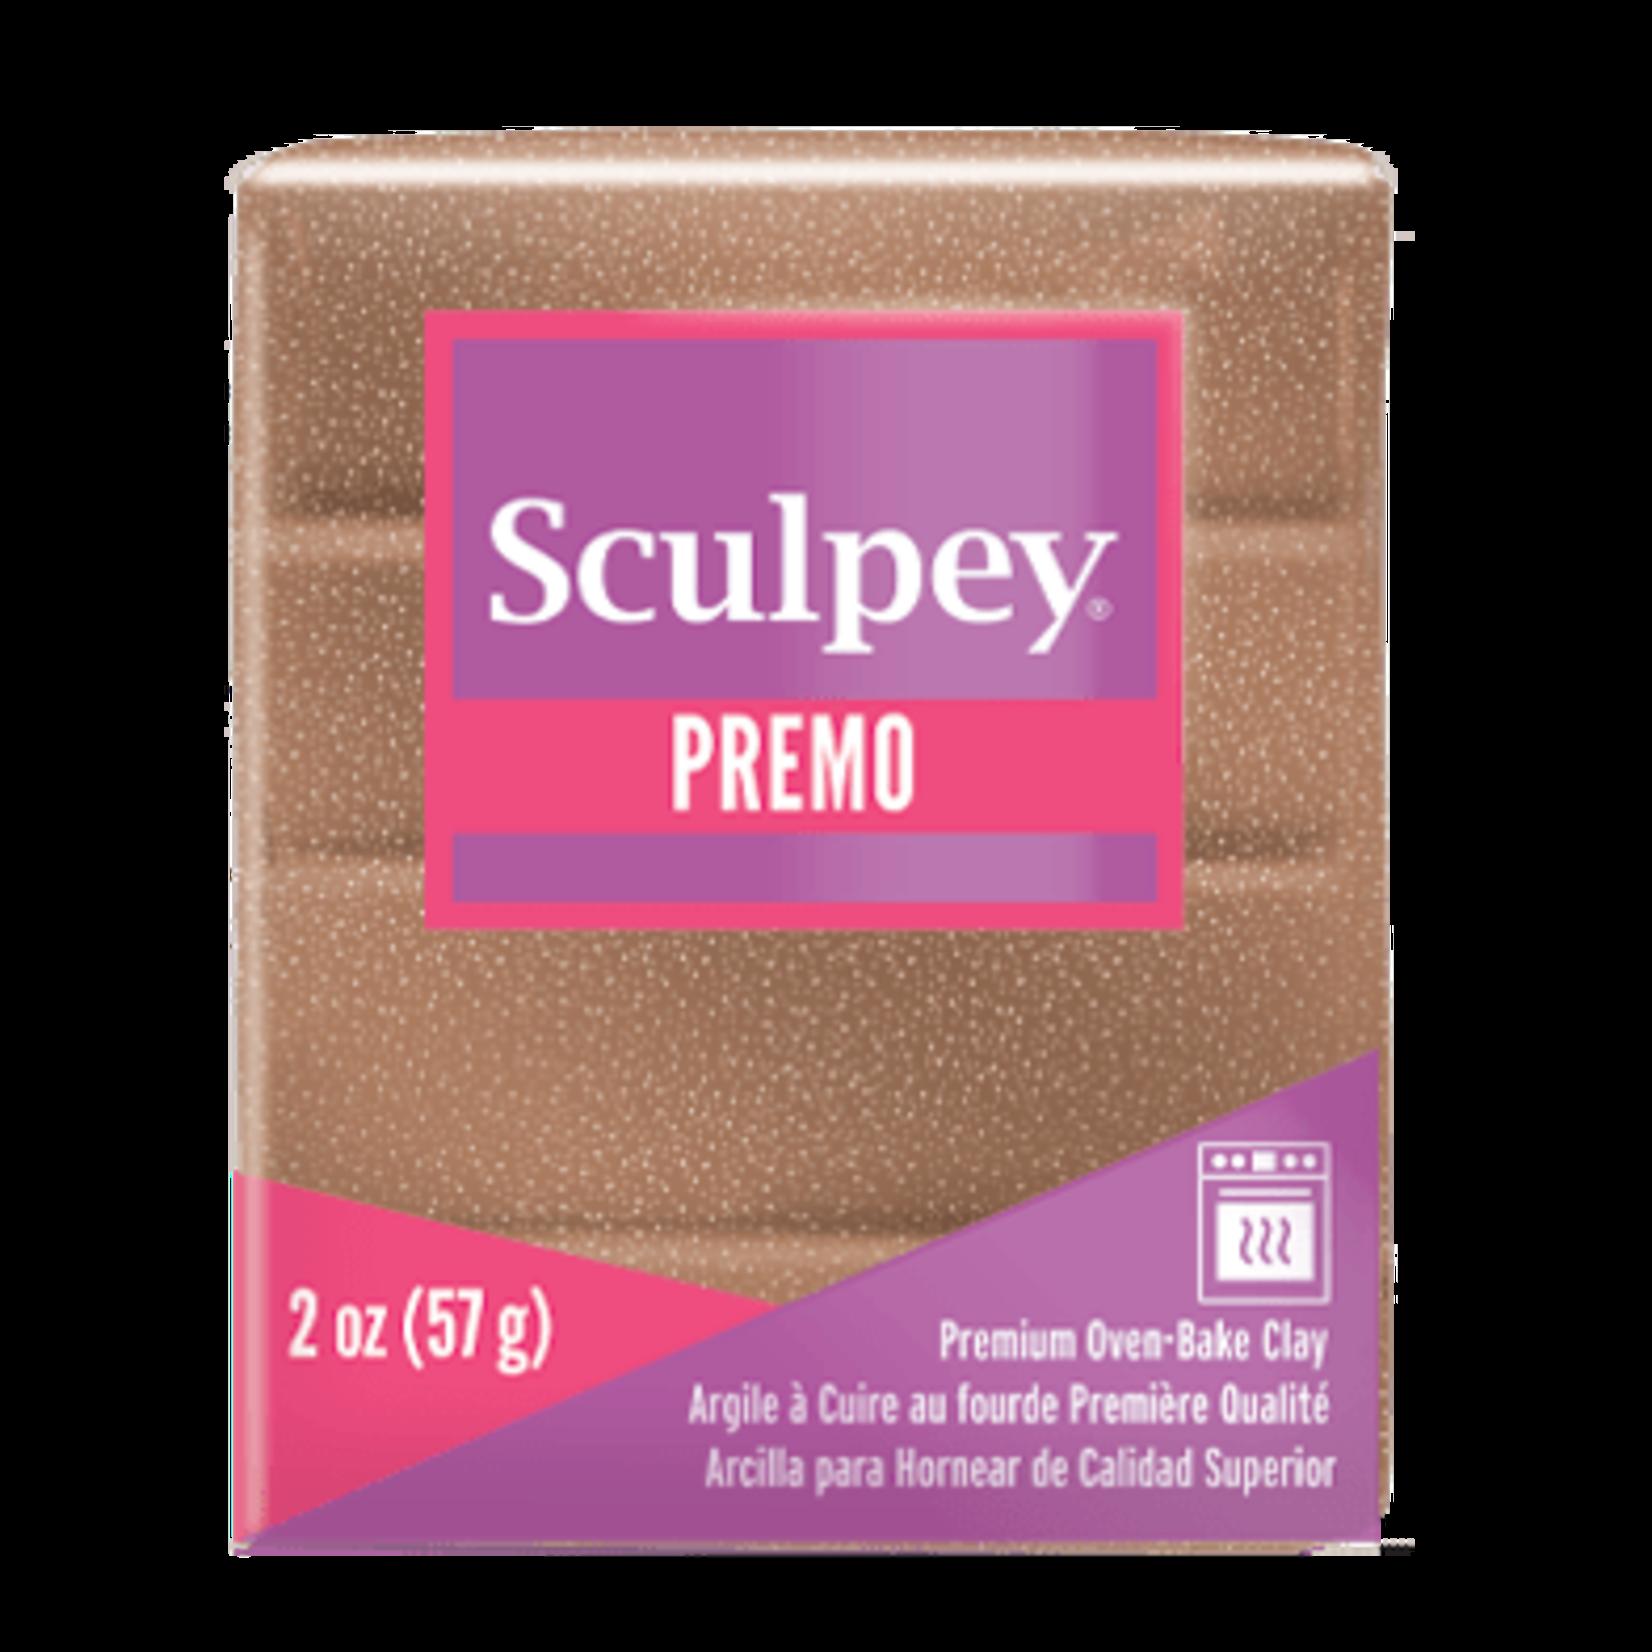 Sculpey Sculpey Premo   -- Rose Gold Glitter